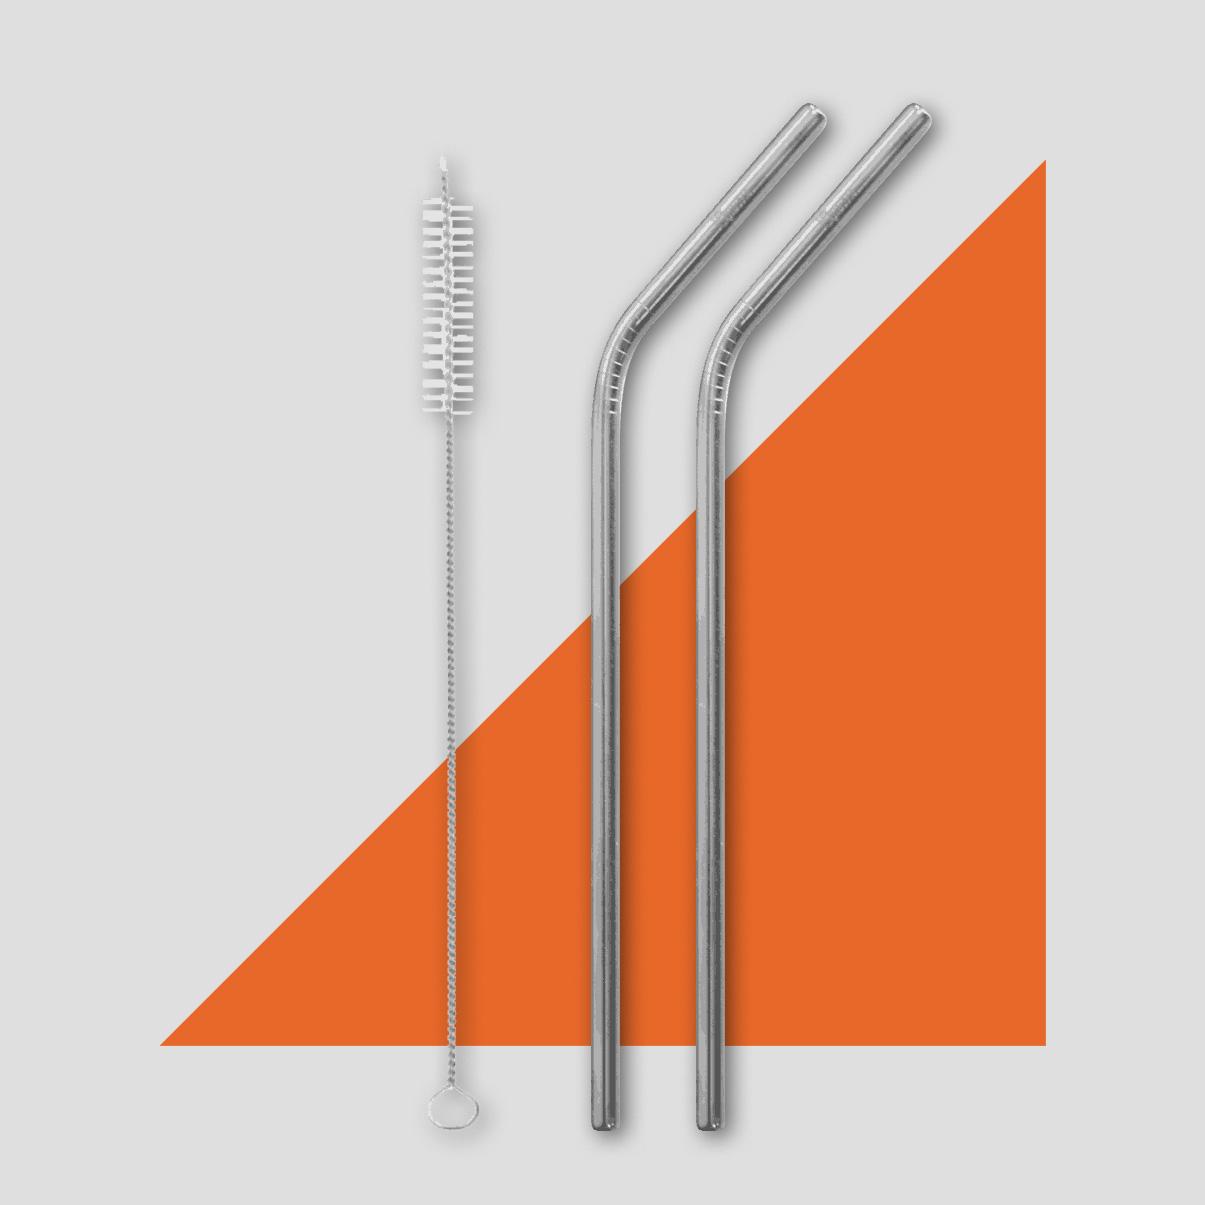 Paille en acier inoxydable personnalisable by Mavip